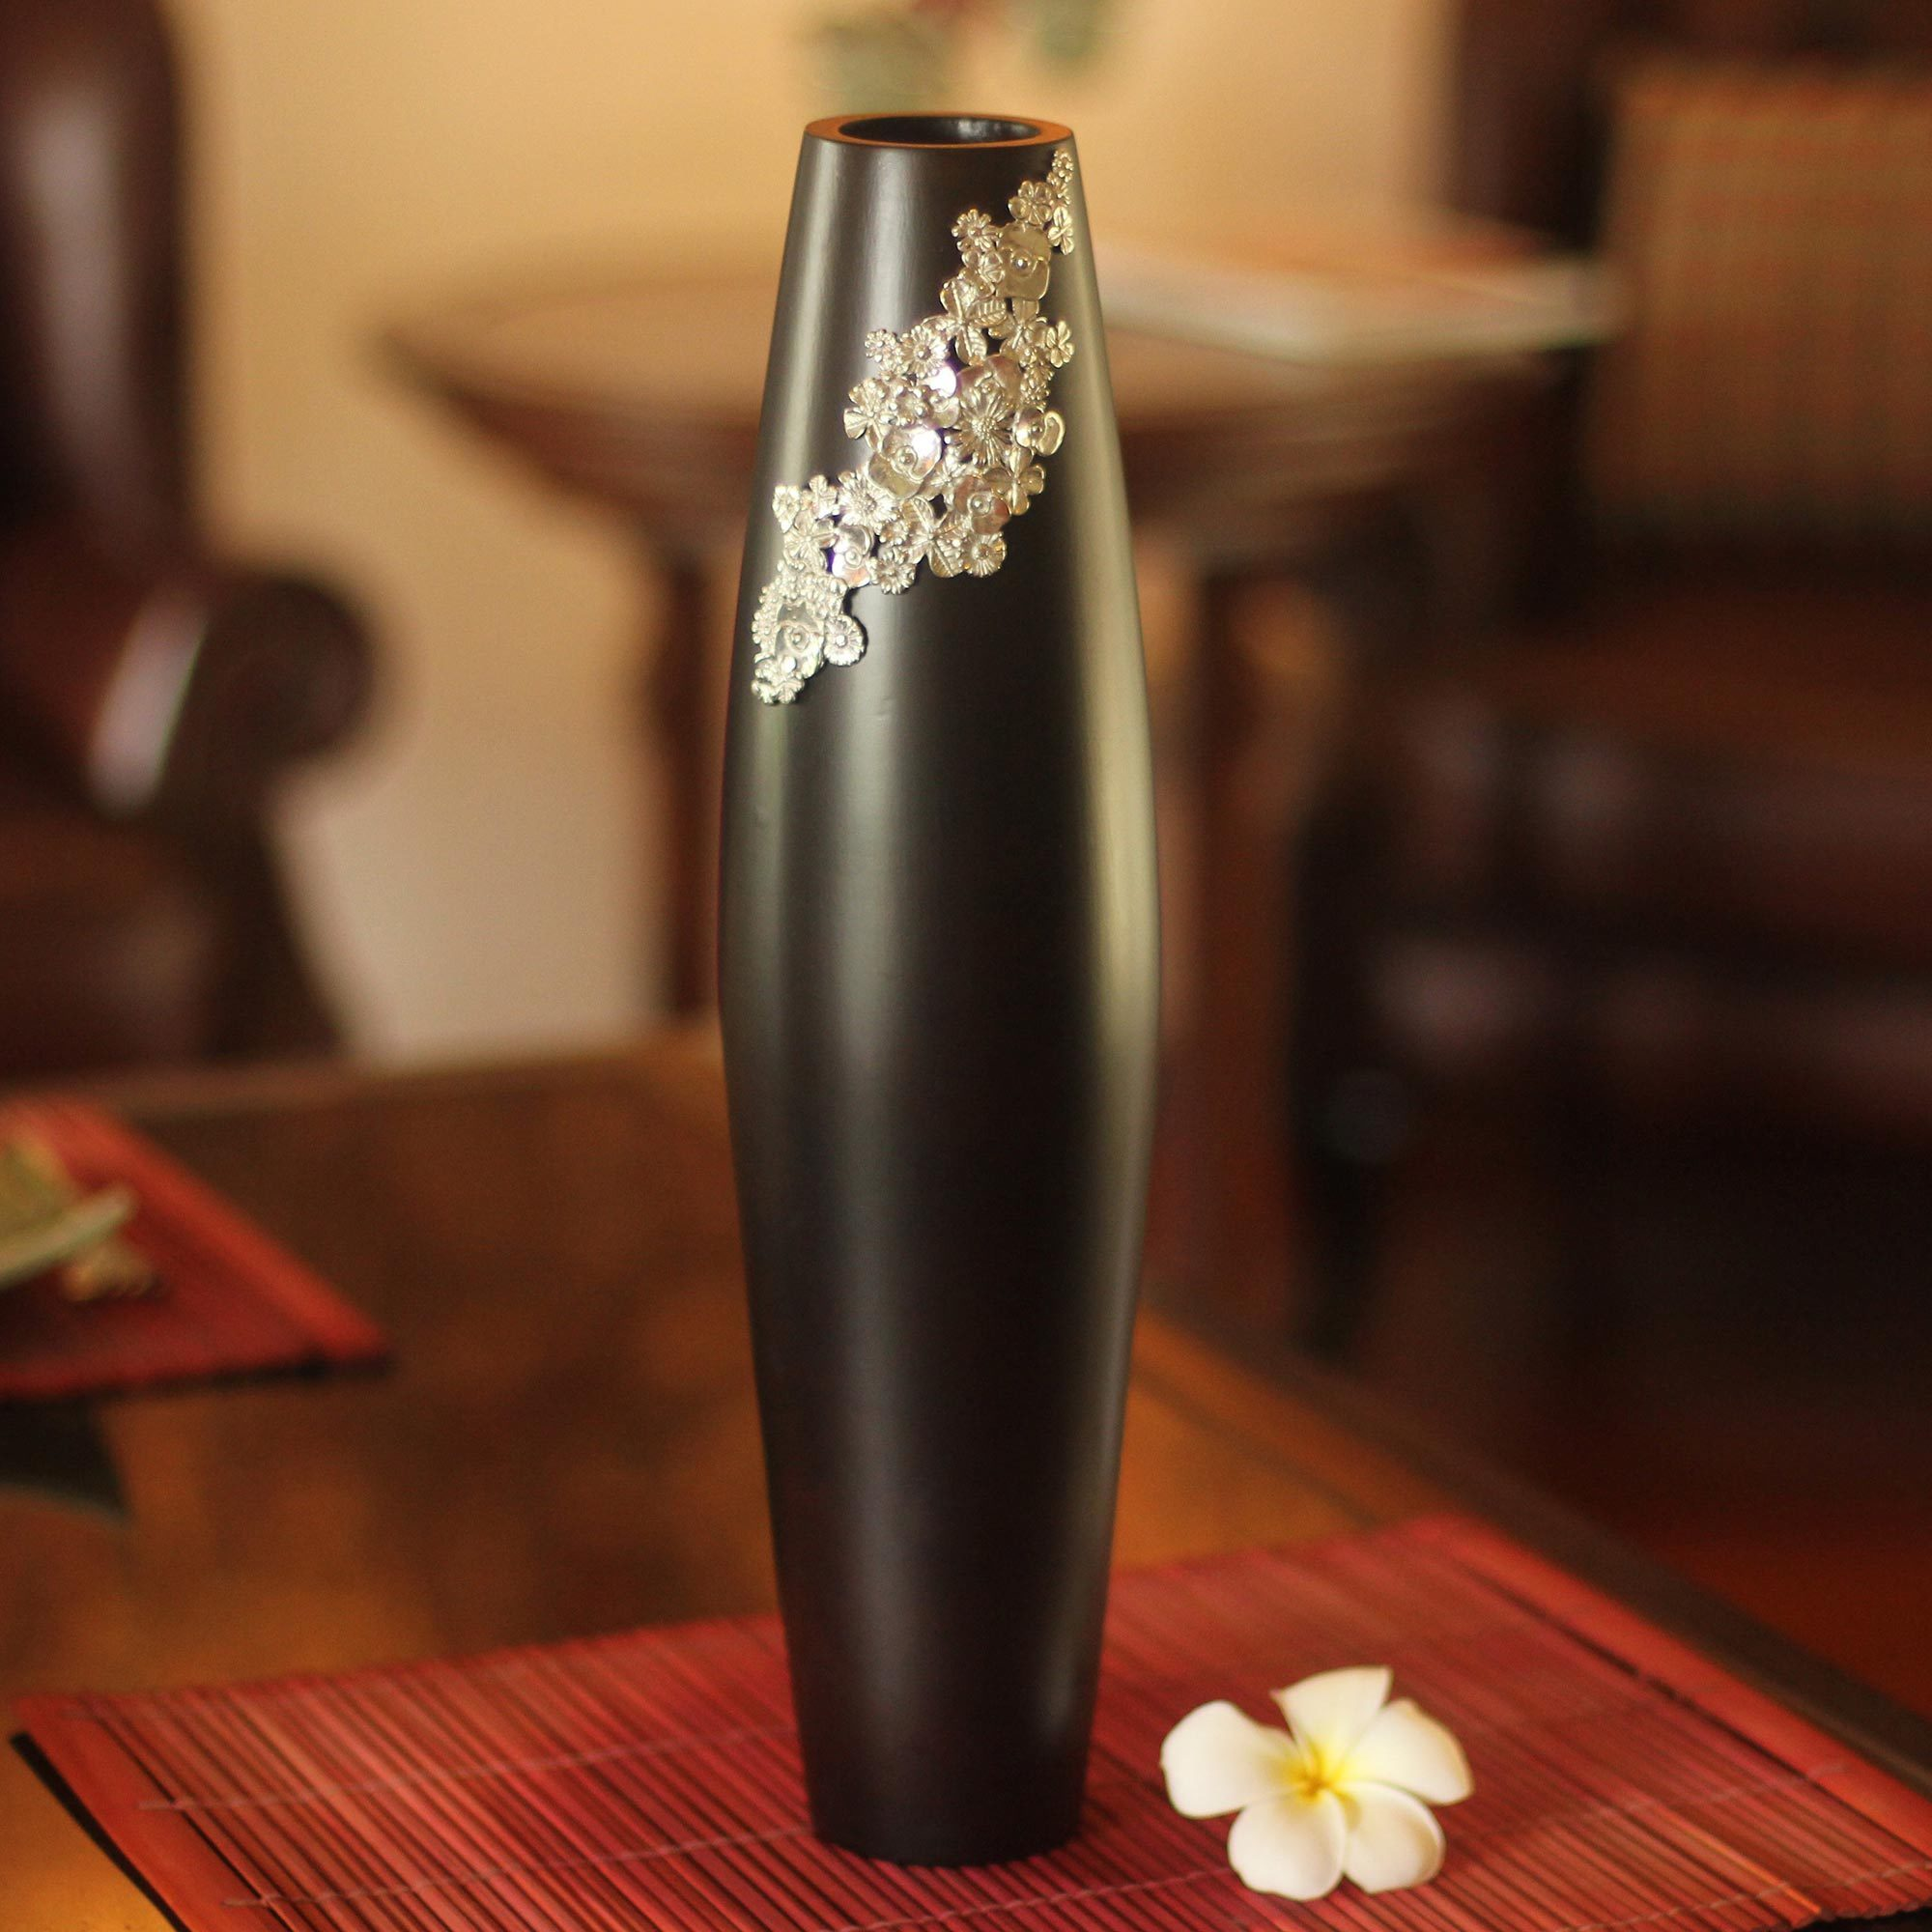 Decorative Daisy Flower Black and Brown Mango Tree Wooden Vase